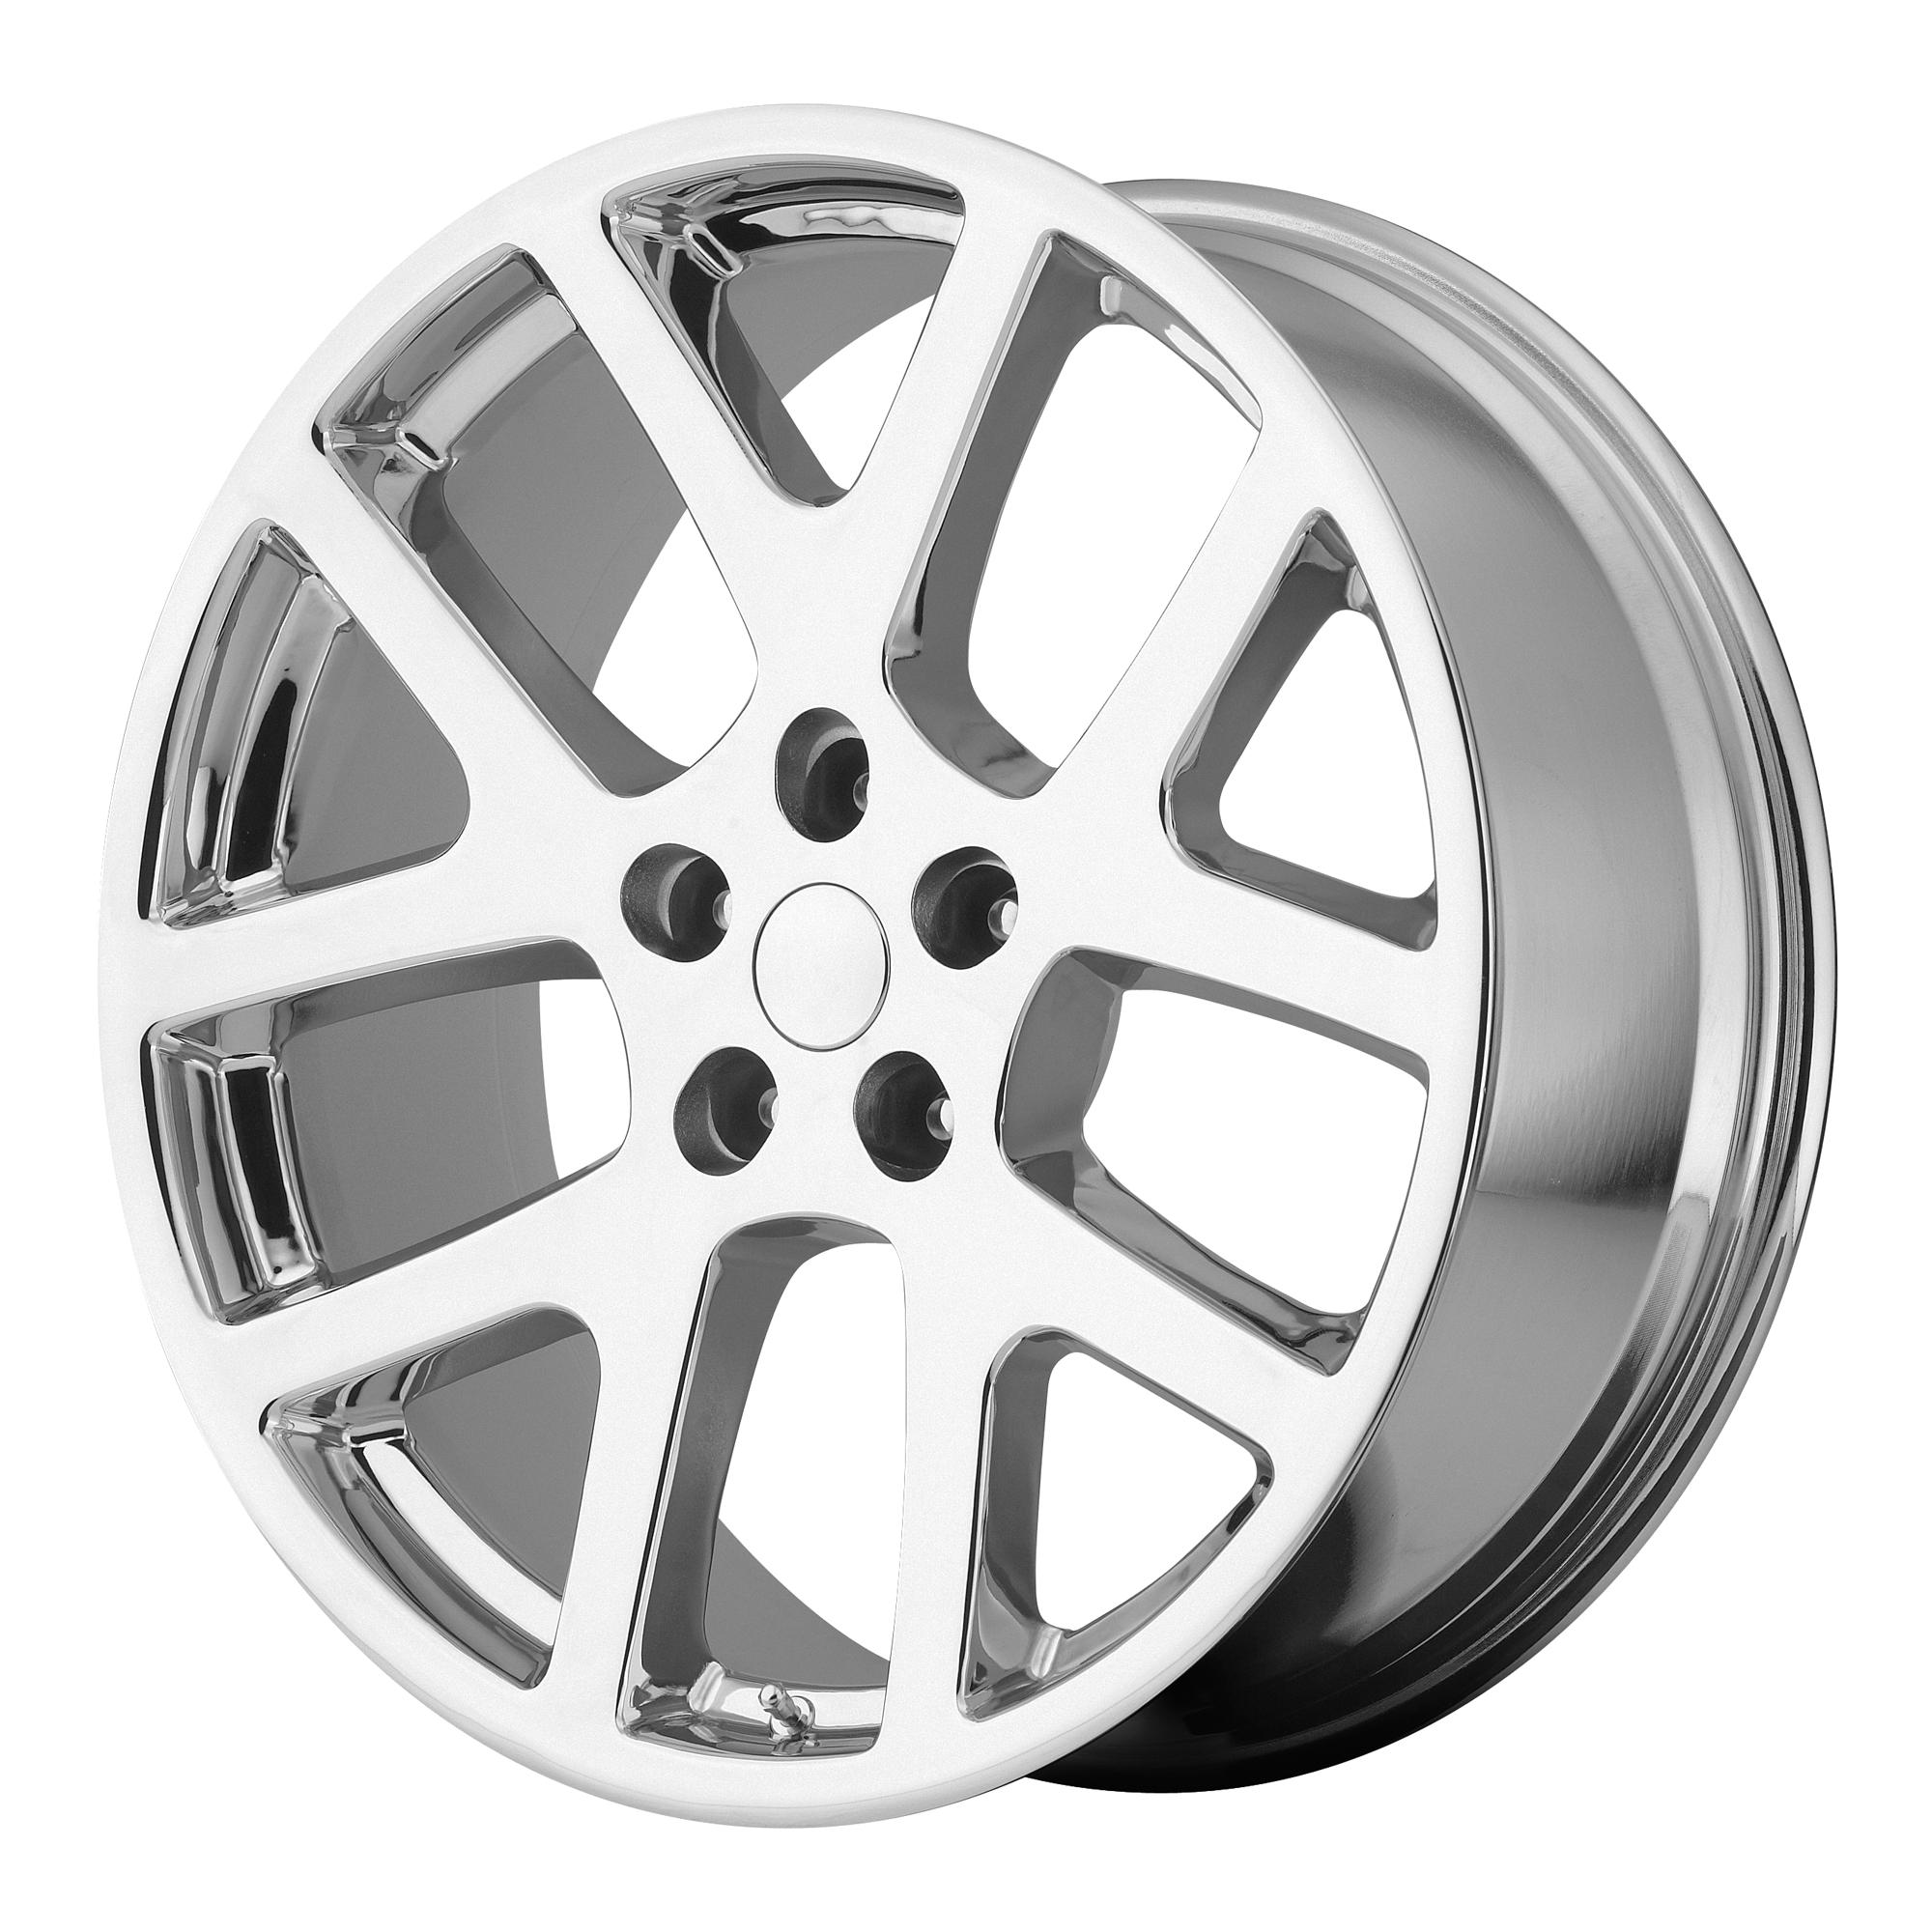 OE Creations Replica Wheels OE Creations PR149 Chrome